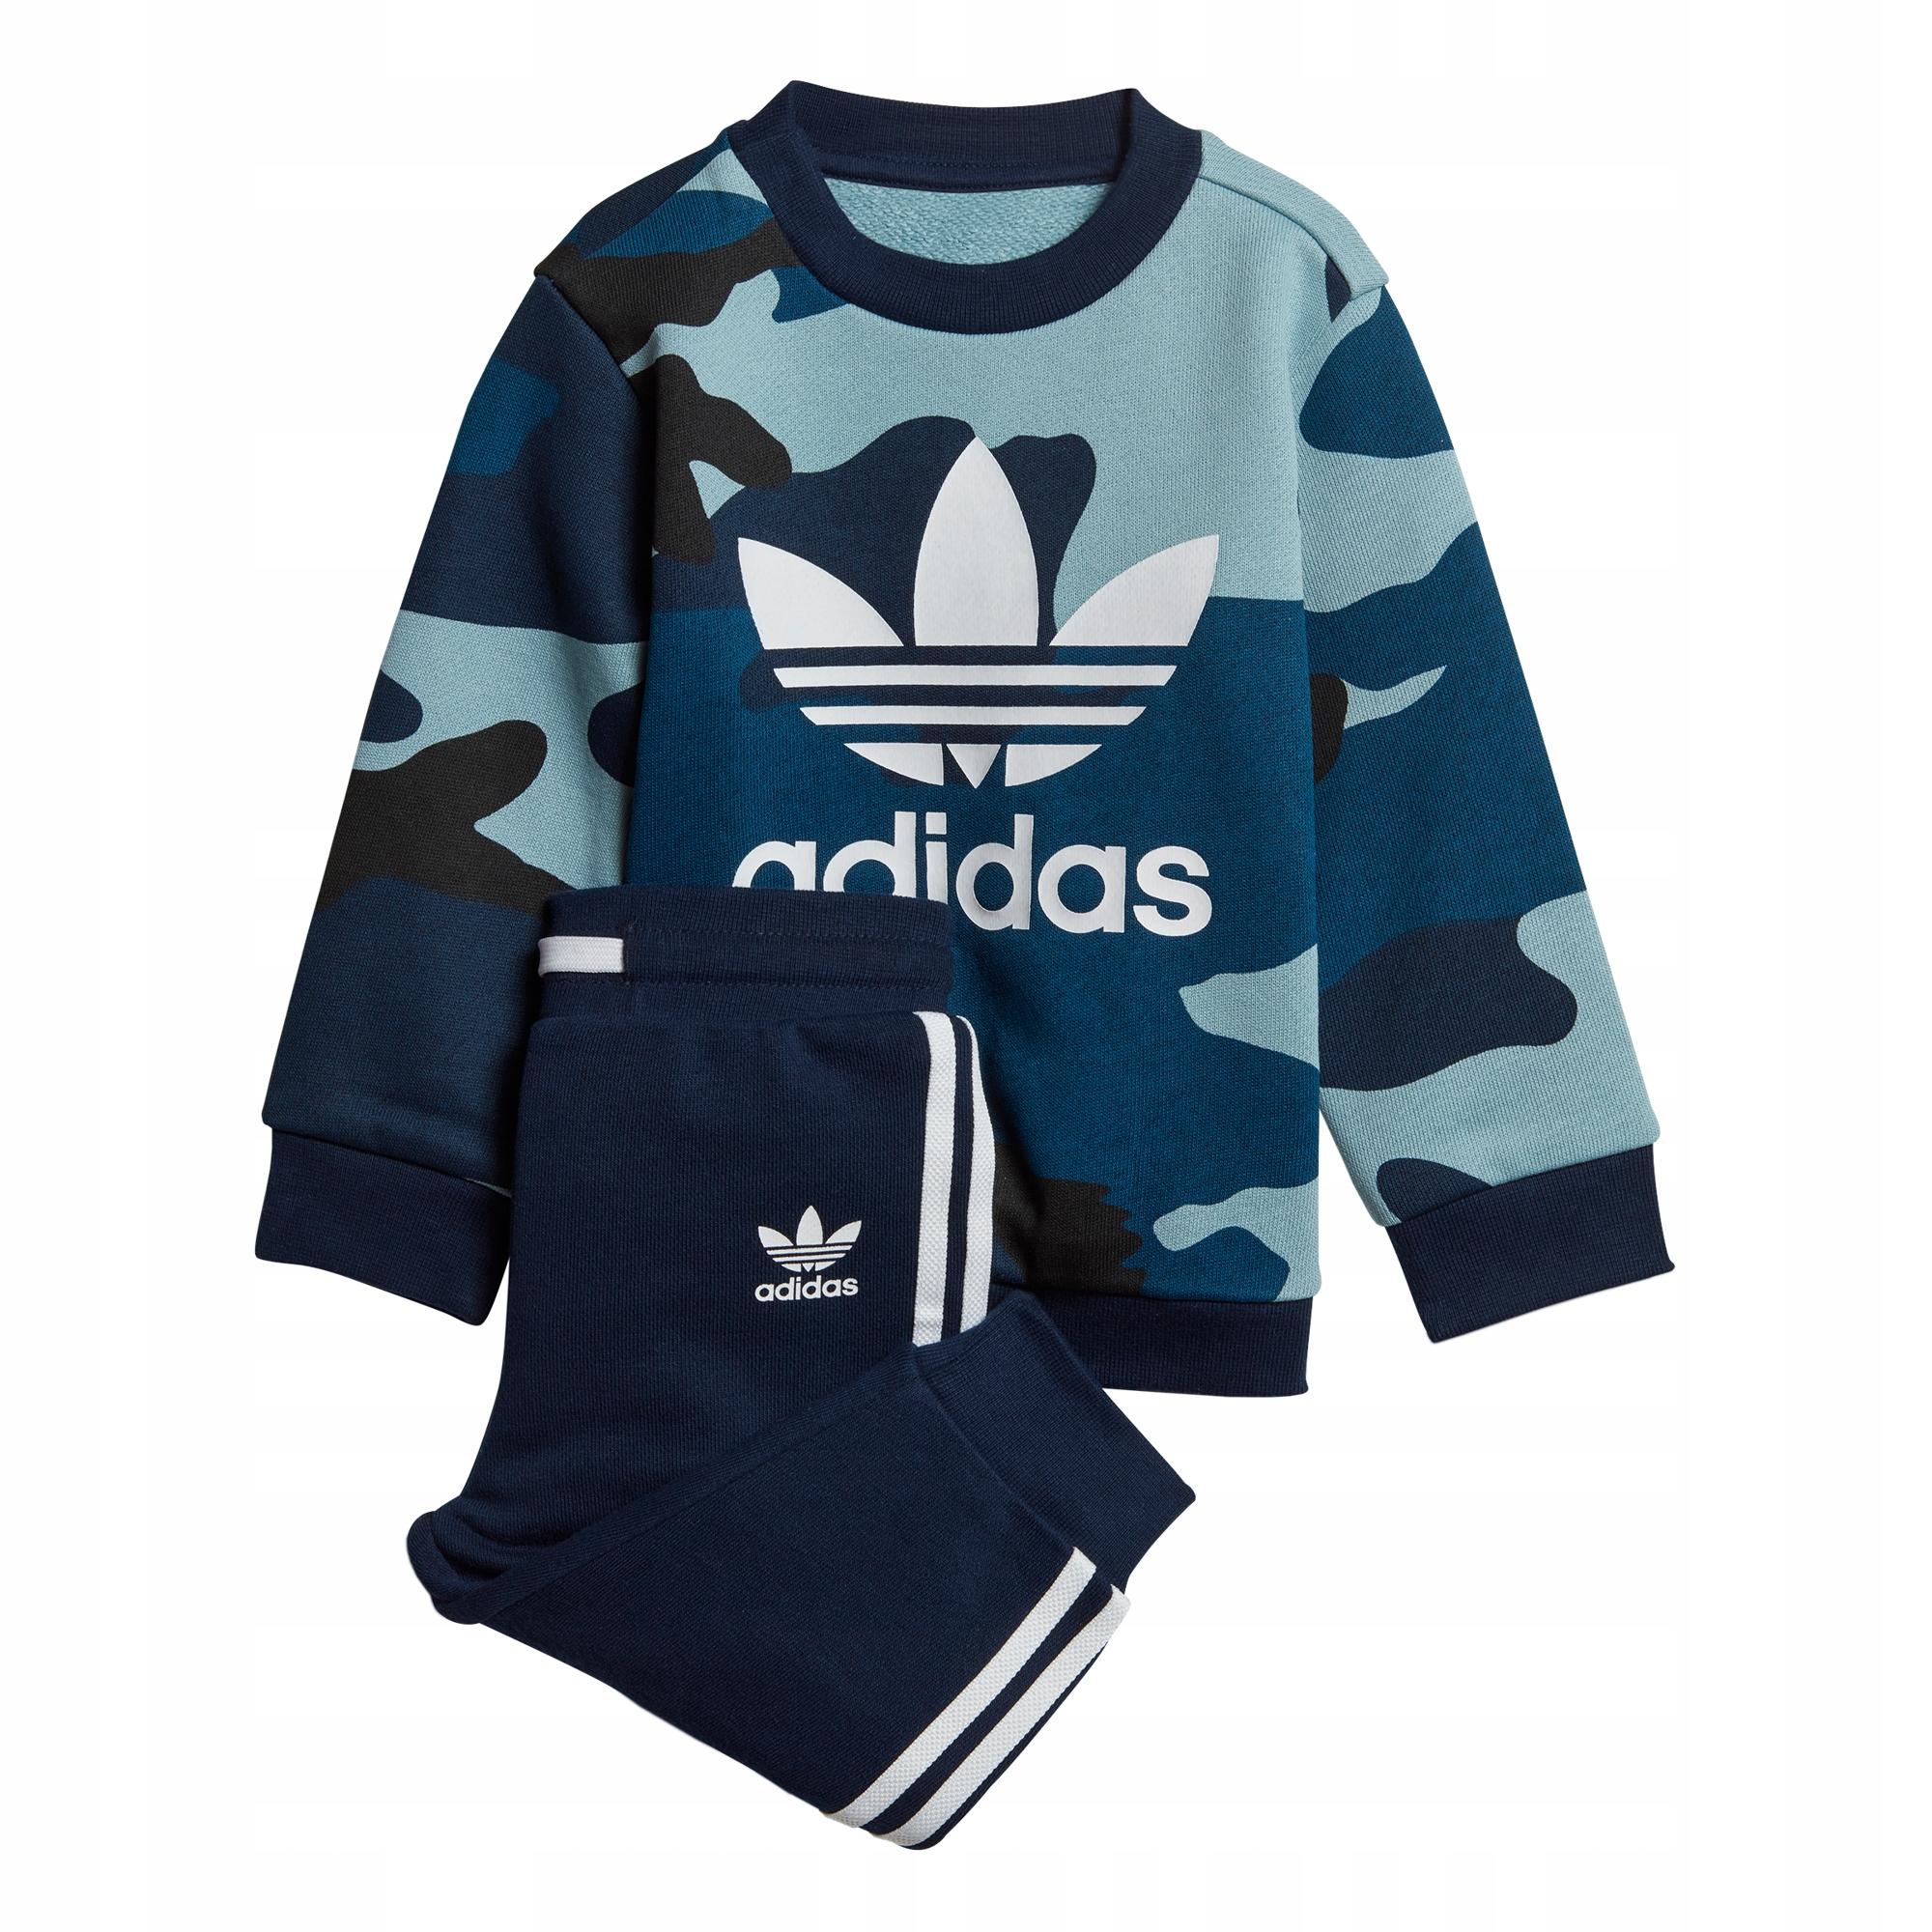 239b62c84eb54 dres dziecięcy adidas originals r 98 DW3856 7937960617 - Allegro.pl